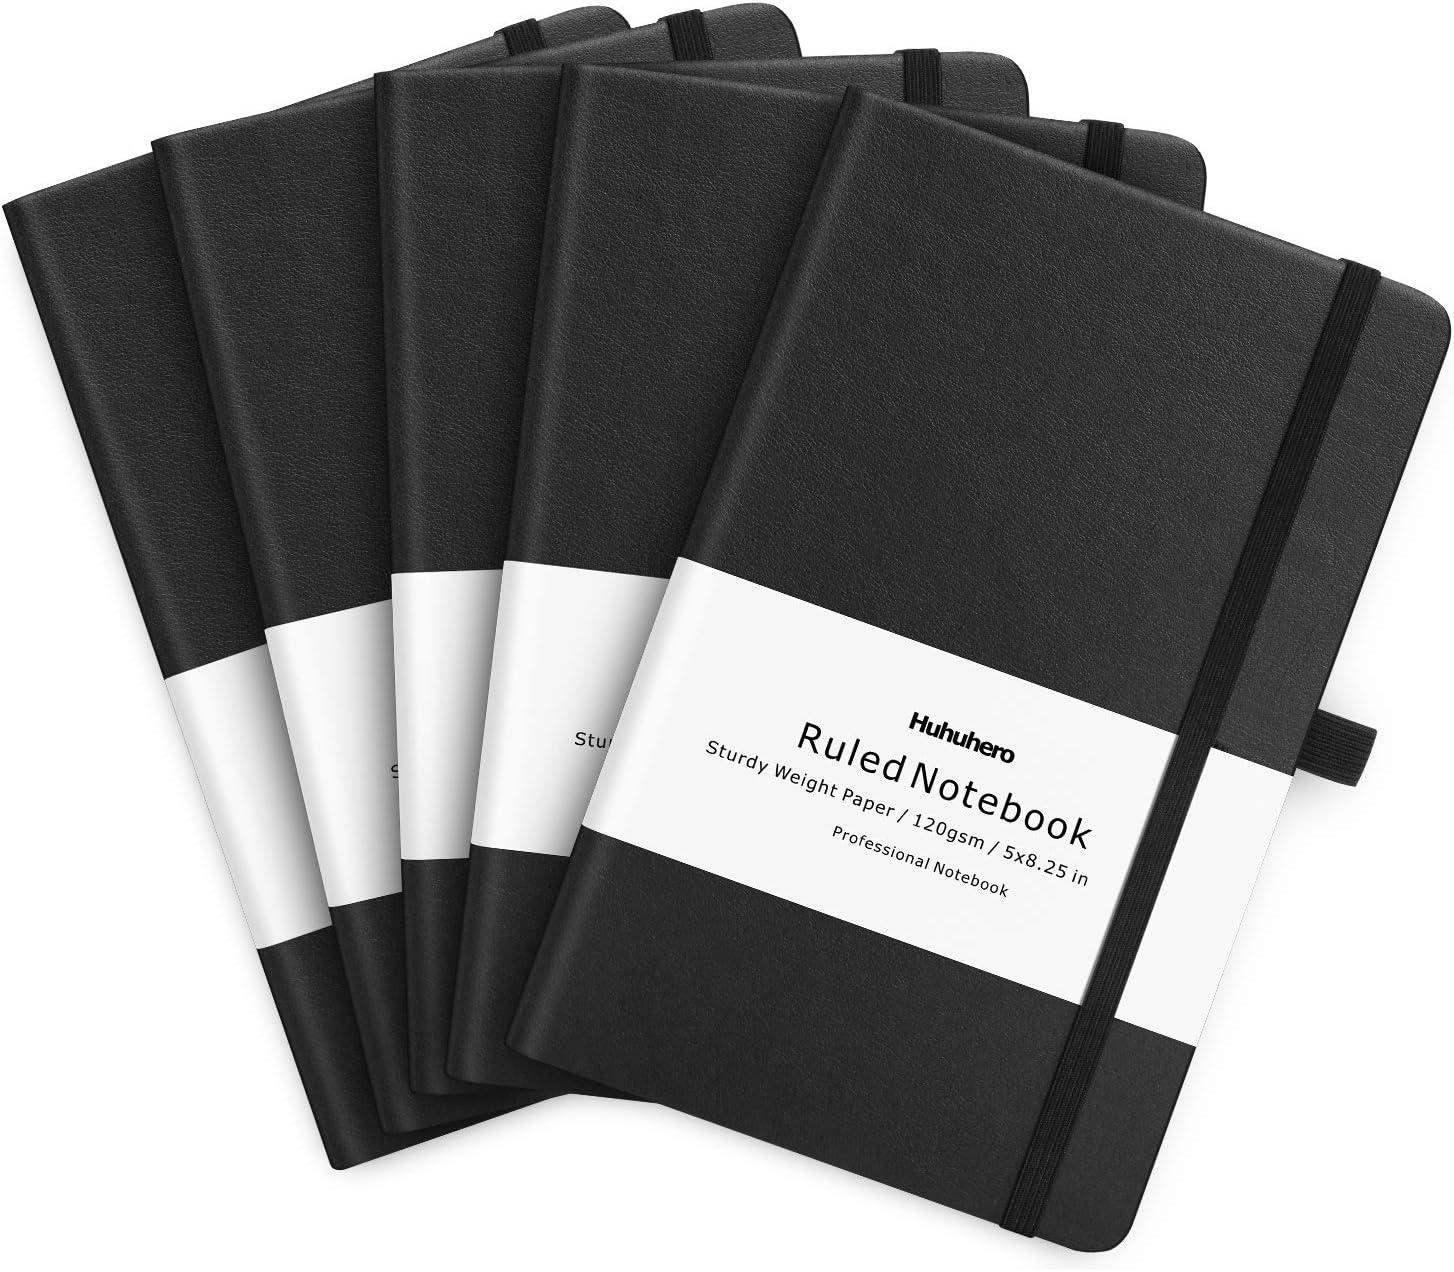 Huhuhero 5 price Pack Popular popular Notebooks Journals Notebook Ruled 120G Classic